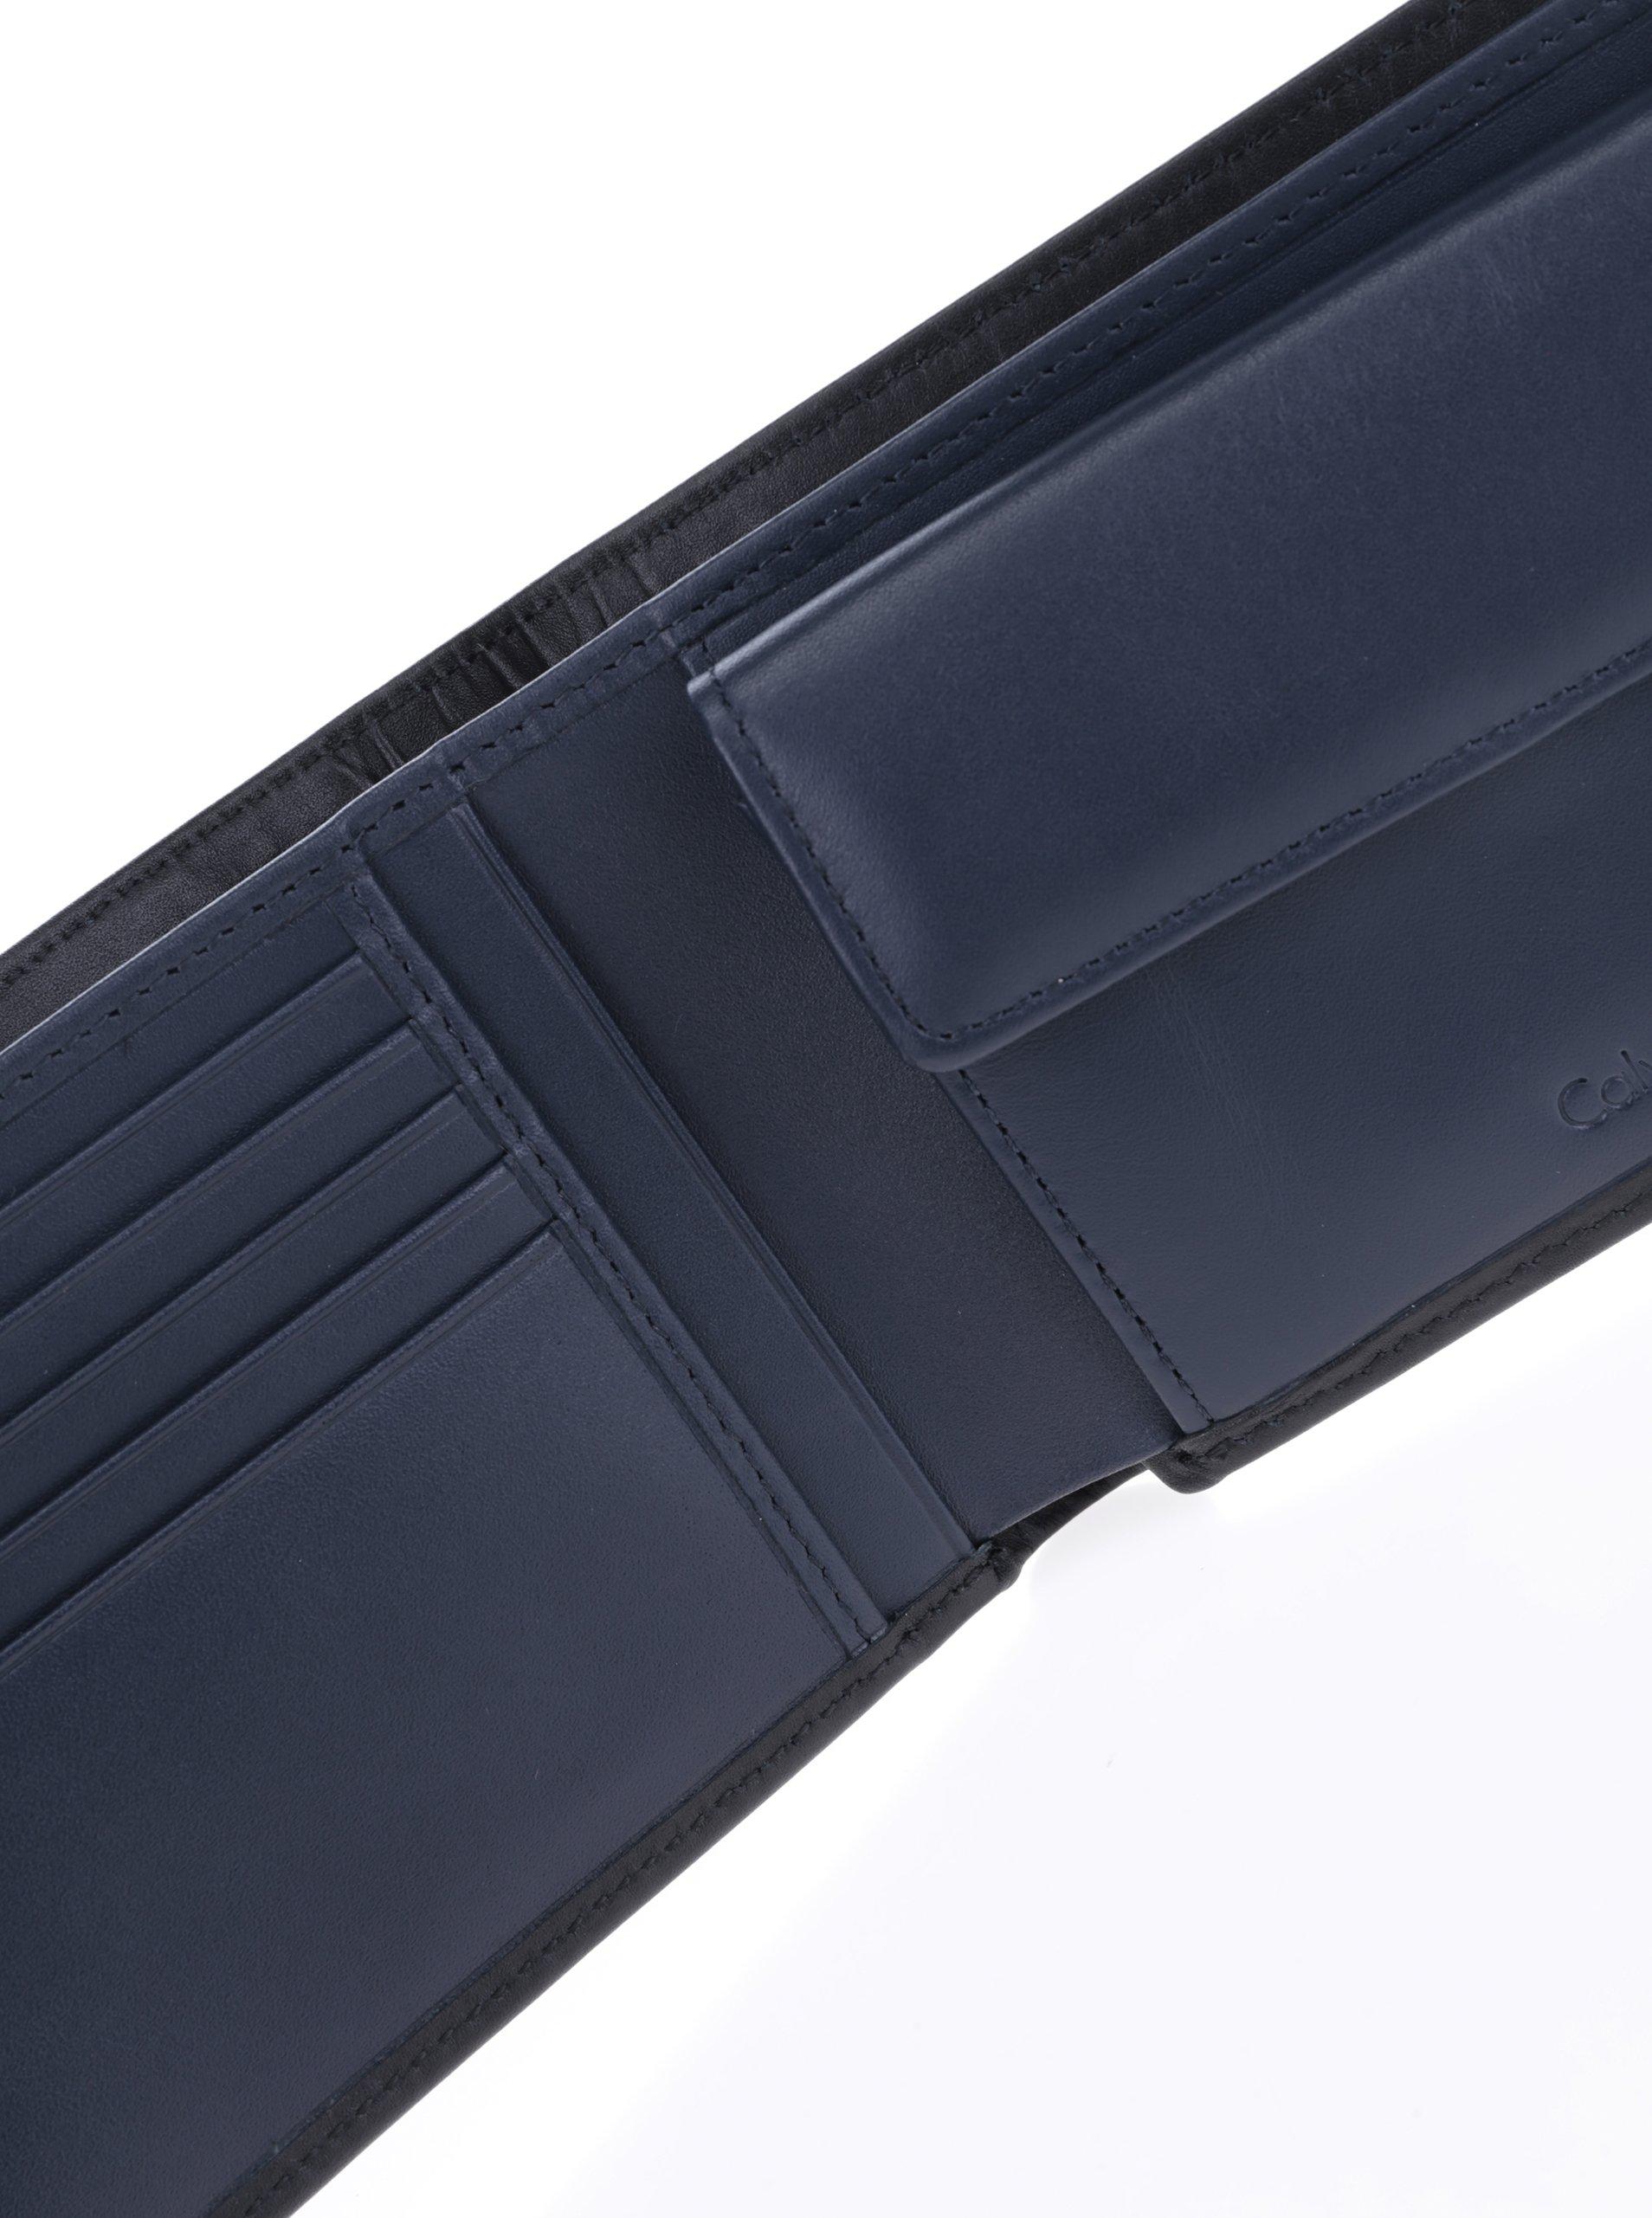 Černá pánská kožená peněženka Calvin Klein Jeans - Akční cena ... bd686b0e1a0